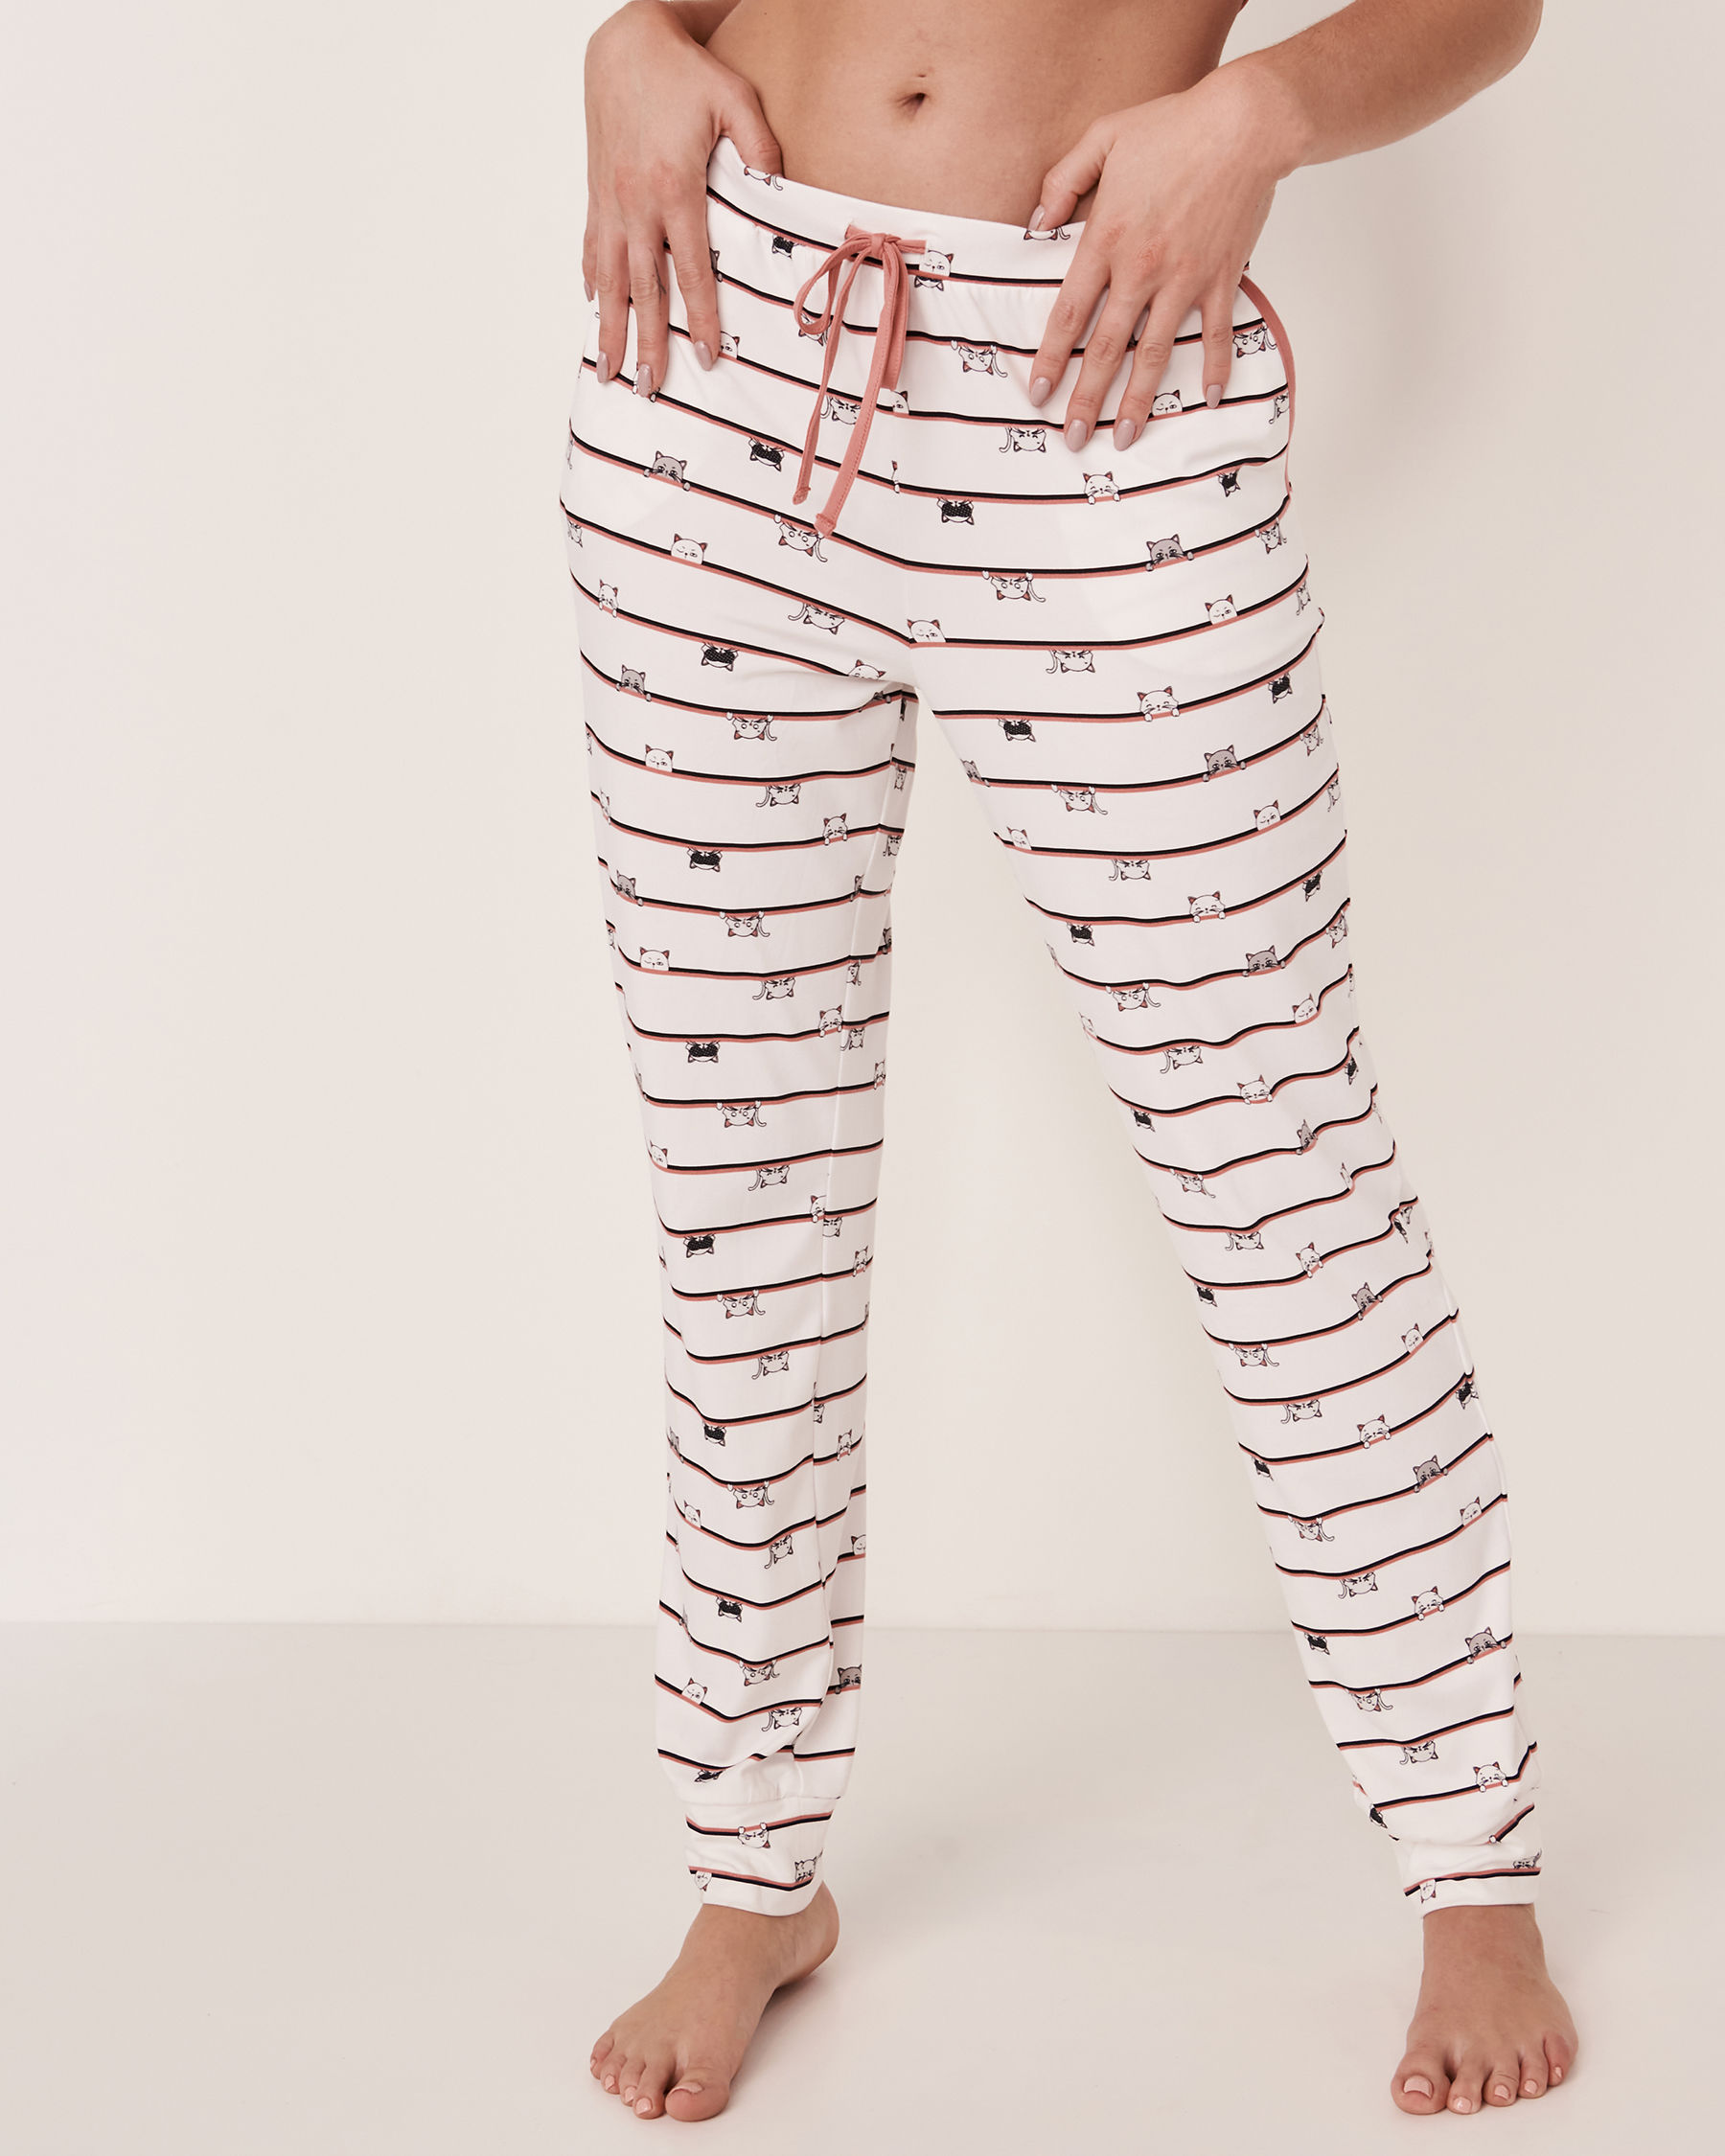 LA VIE EN ROSE Fitted Pyjama Pant Cats stripe 40200081 - View1